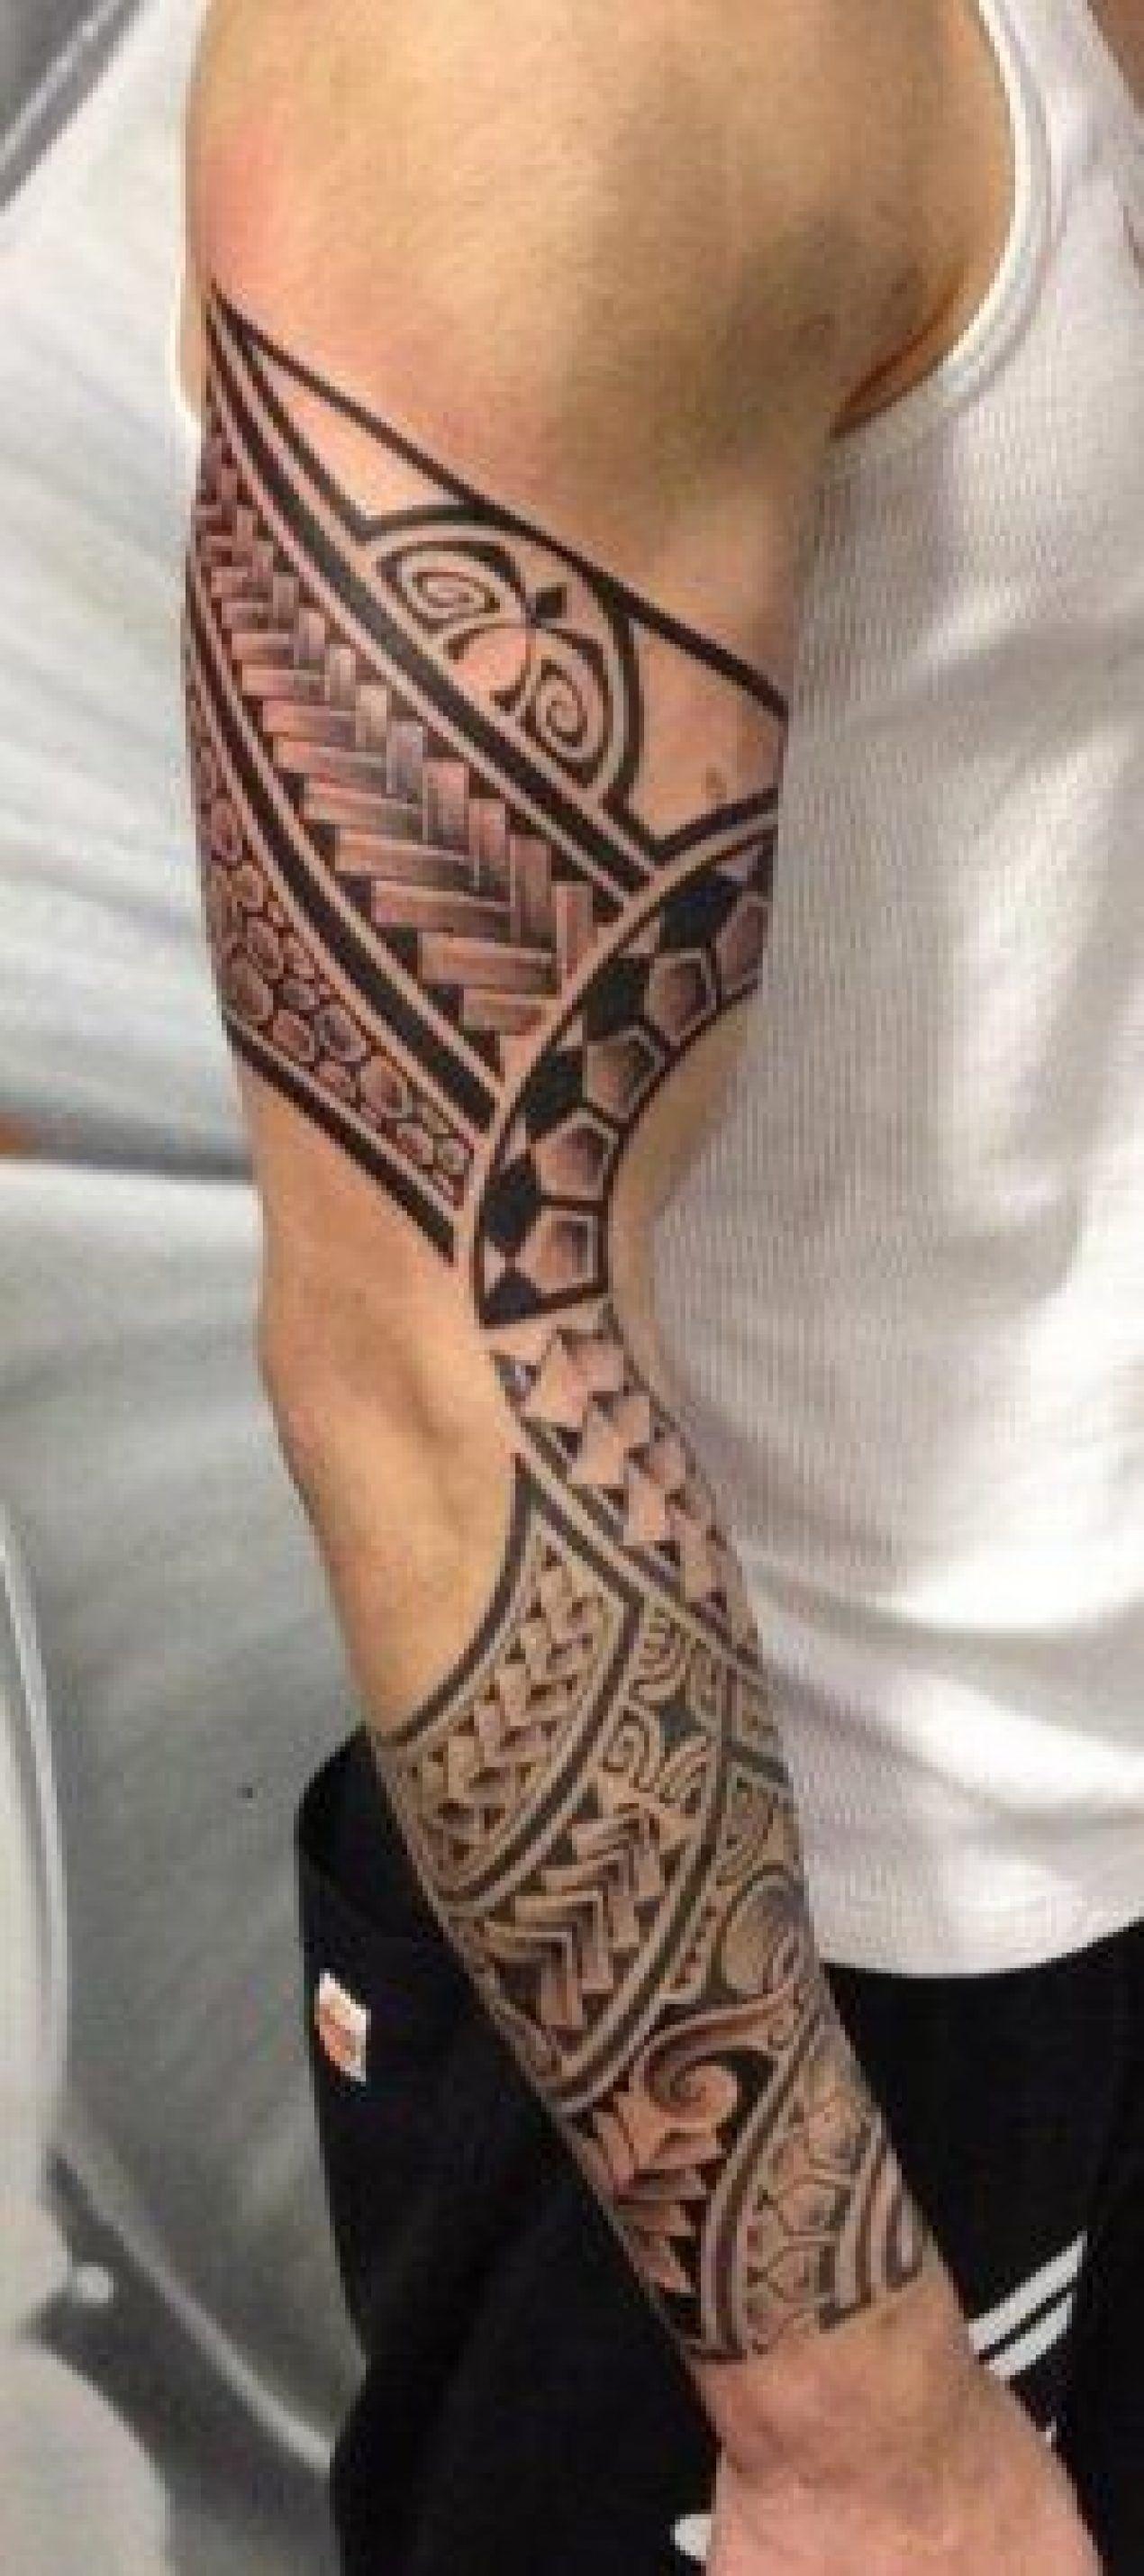 tatouage polyn sien patchwork tatouage tribal. Black Bedroom Furniture Sets. Home Design Ideas